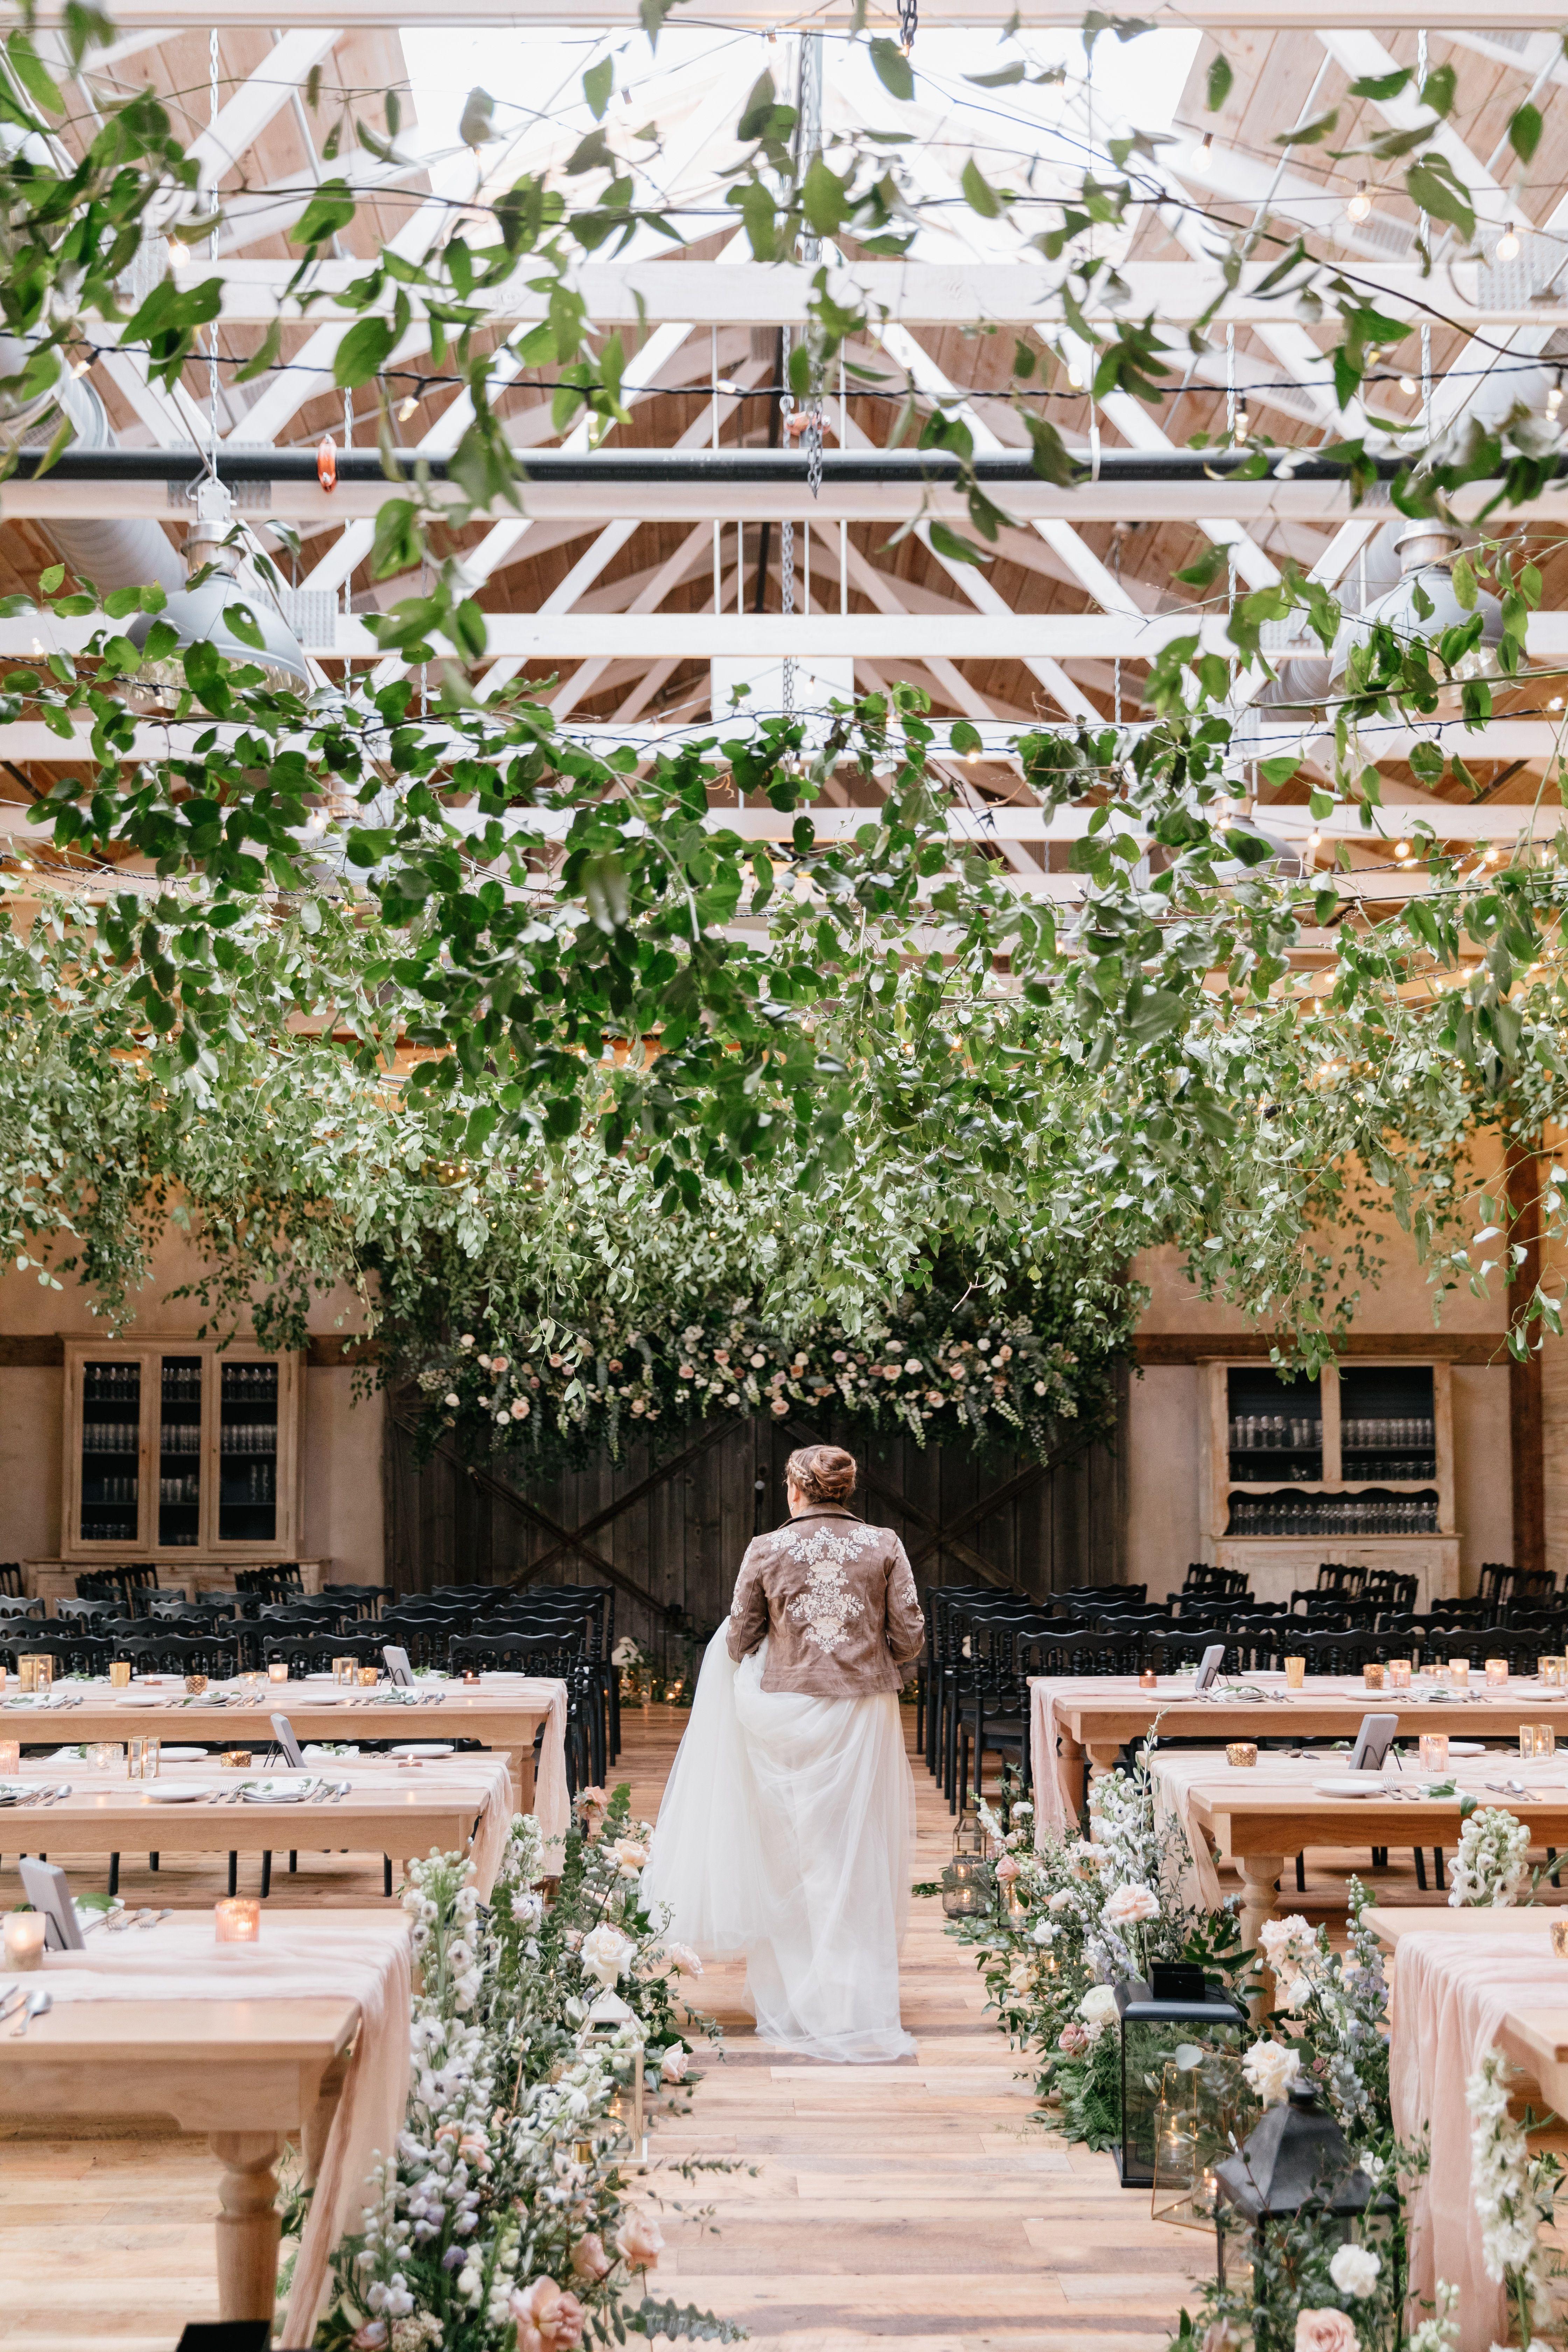 Top 16 Wedding Venues In Philadelphia Bucks County New Jersey And Beyond Wedding Venues Pennsylvania Philadelphia Wedding Venues Wedding Venues